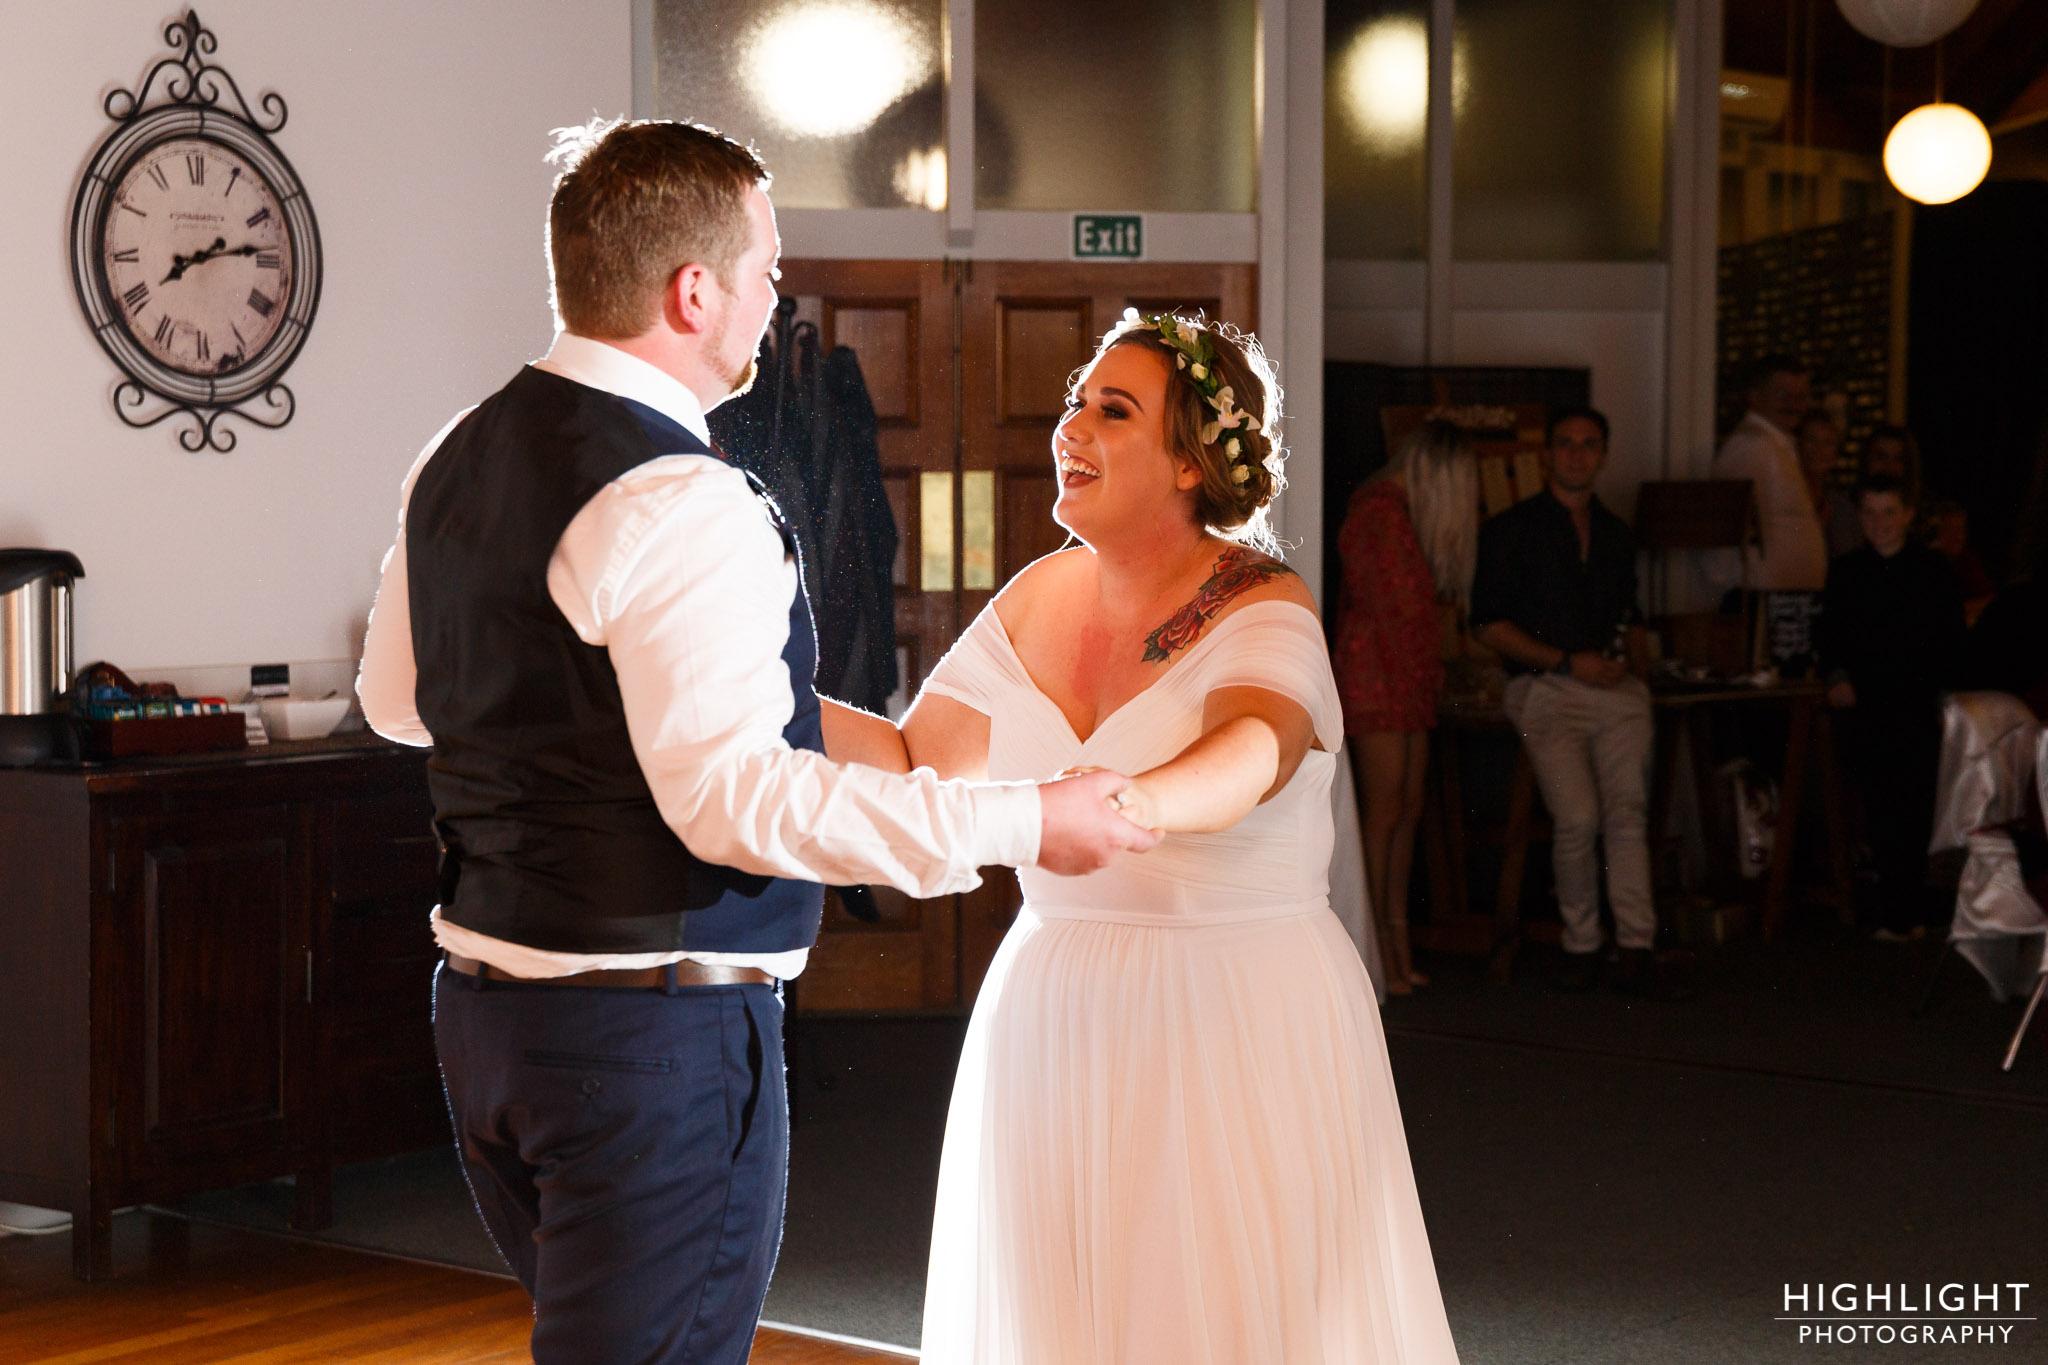 Highlight-wedding-photography-new-zealand-palmerston-north-128.jpg